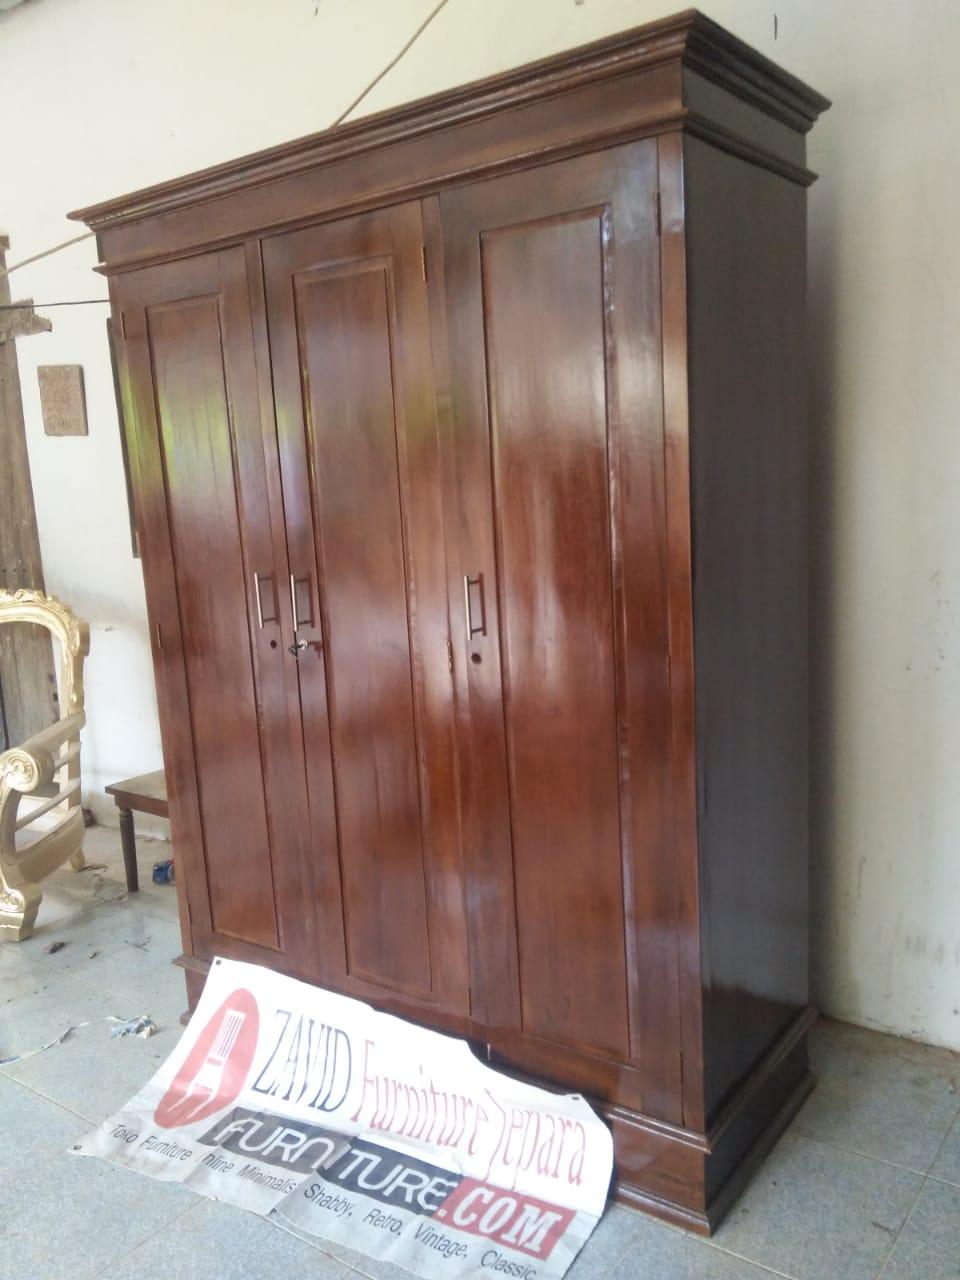 desain-lemari-pakaian-jati-3-pintu Jual Lemari Pakaian Kediri 3 Pintu Kayu Jati Minimalis